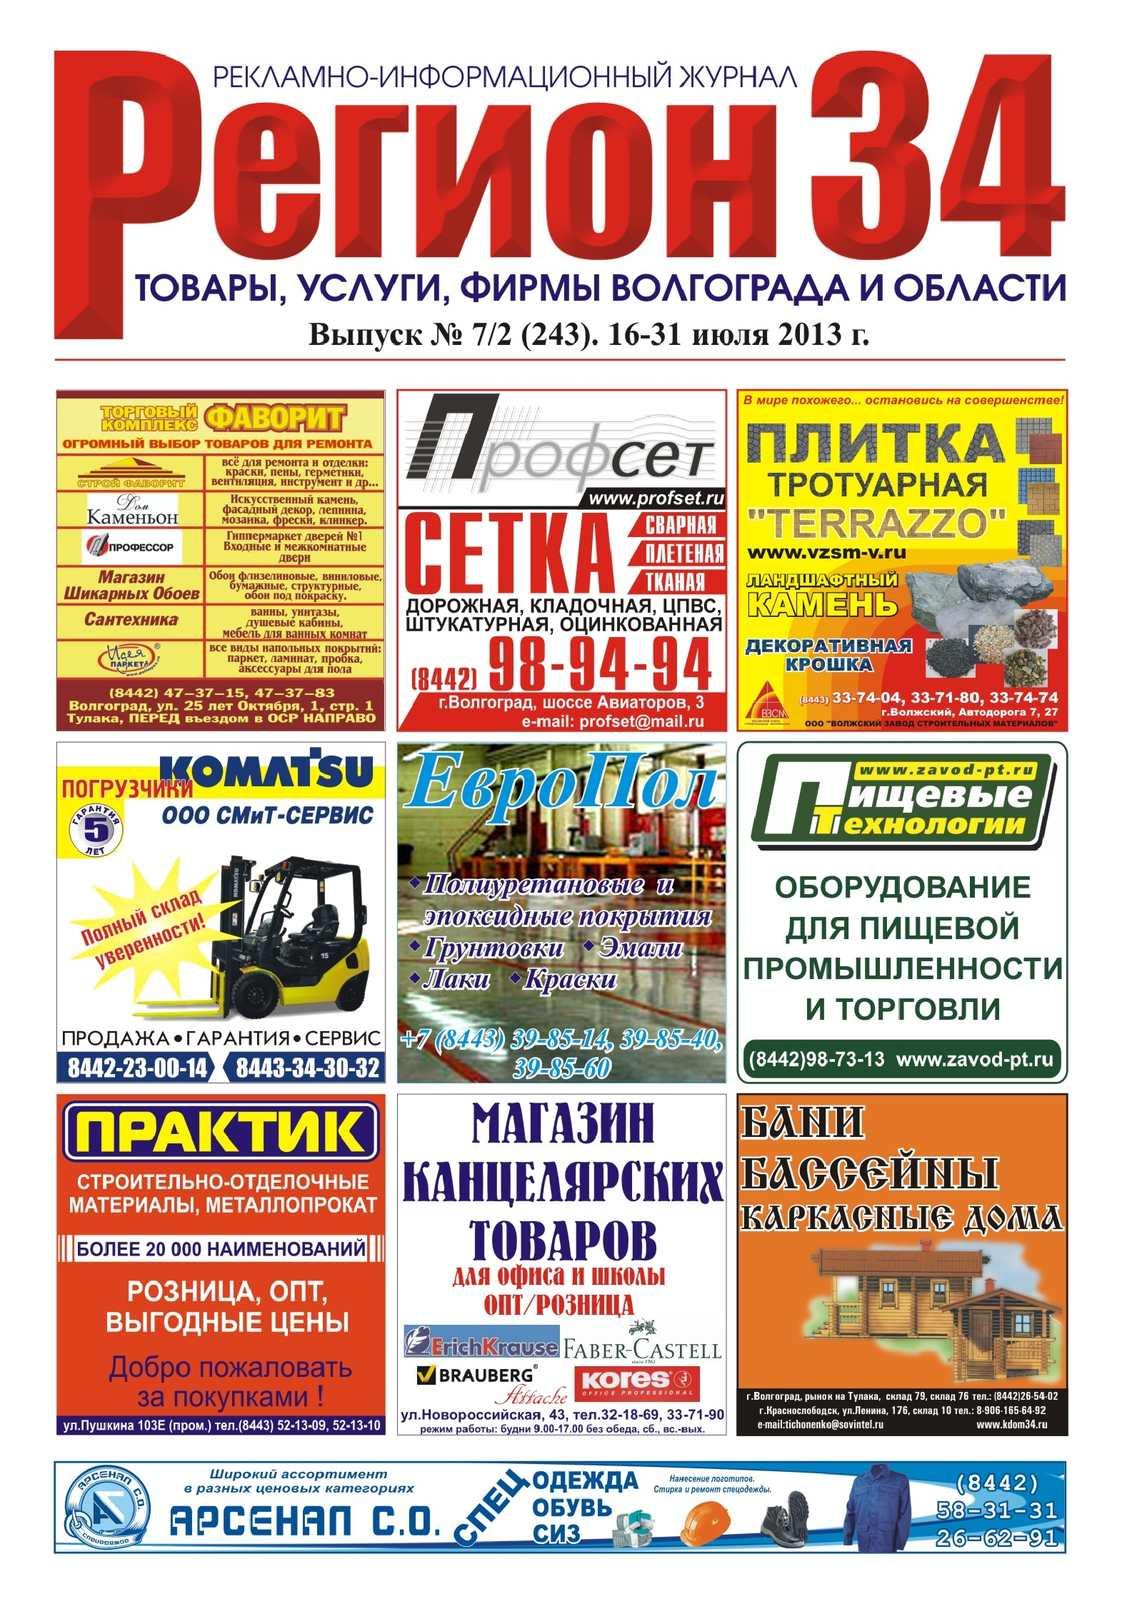 Компания орбит трусики с формалином каталог